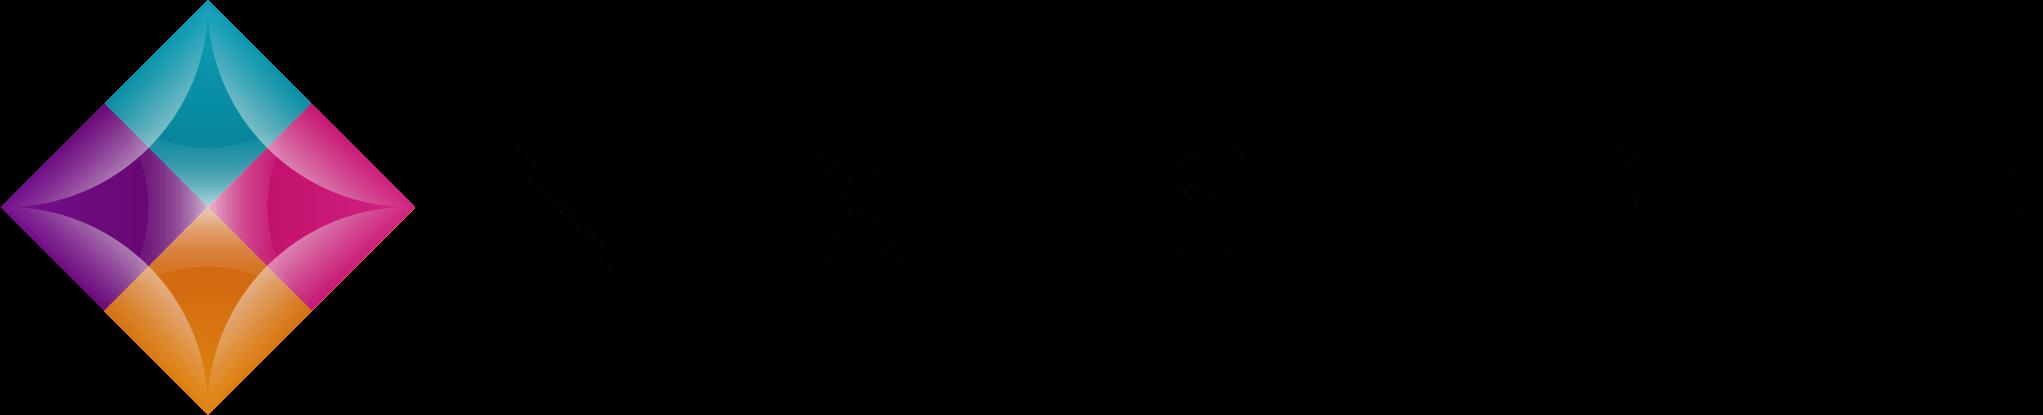 Next Step HR Black Logo